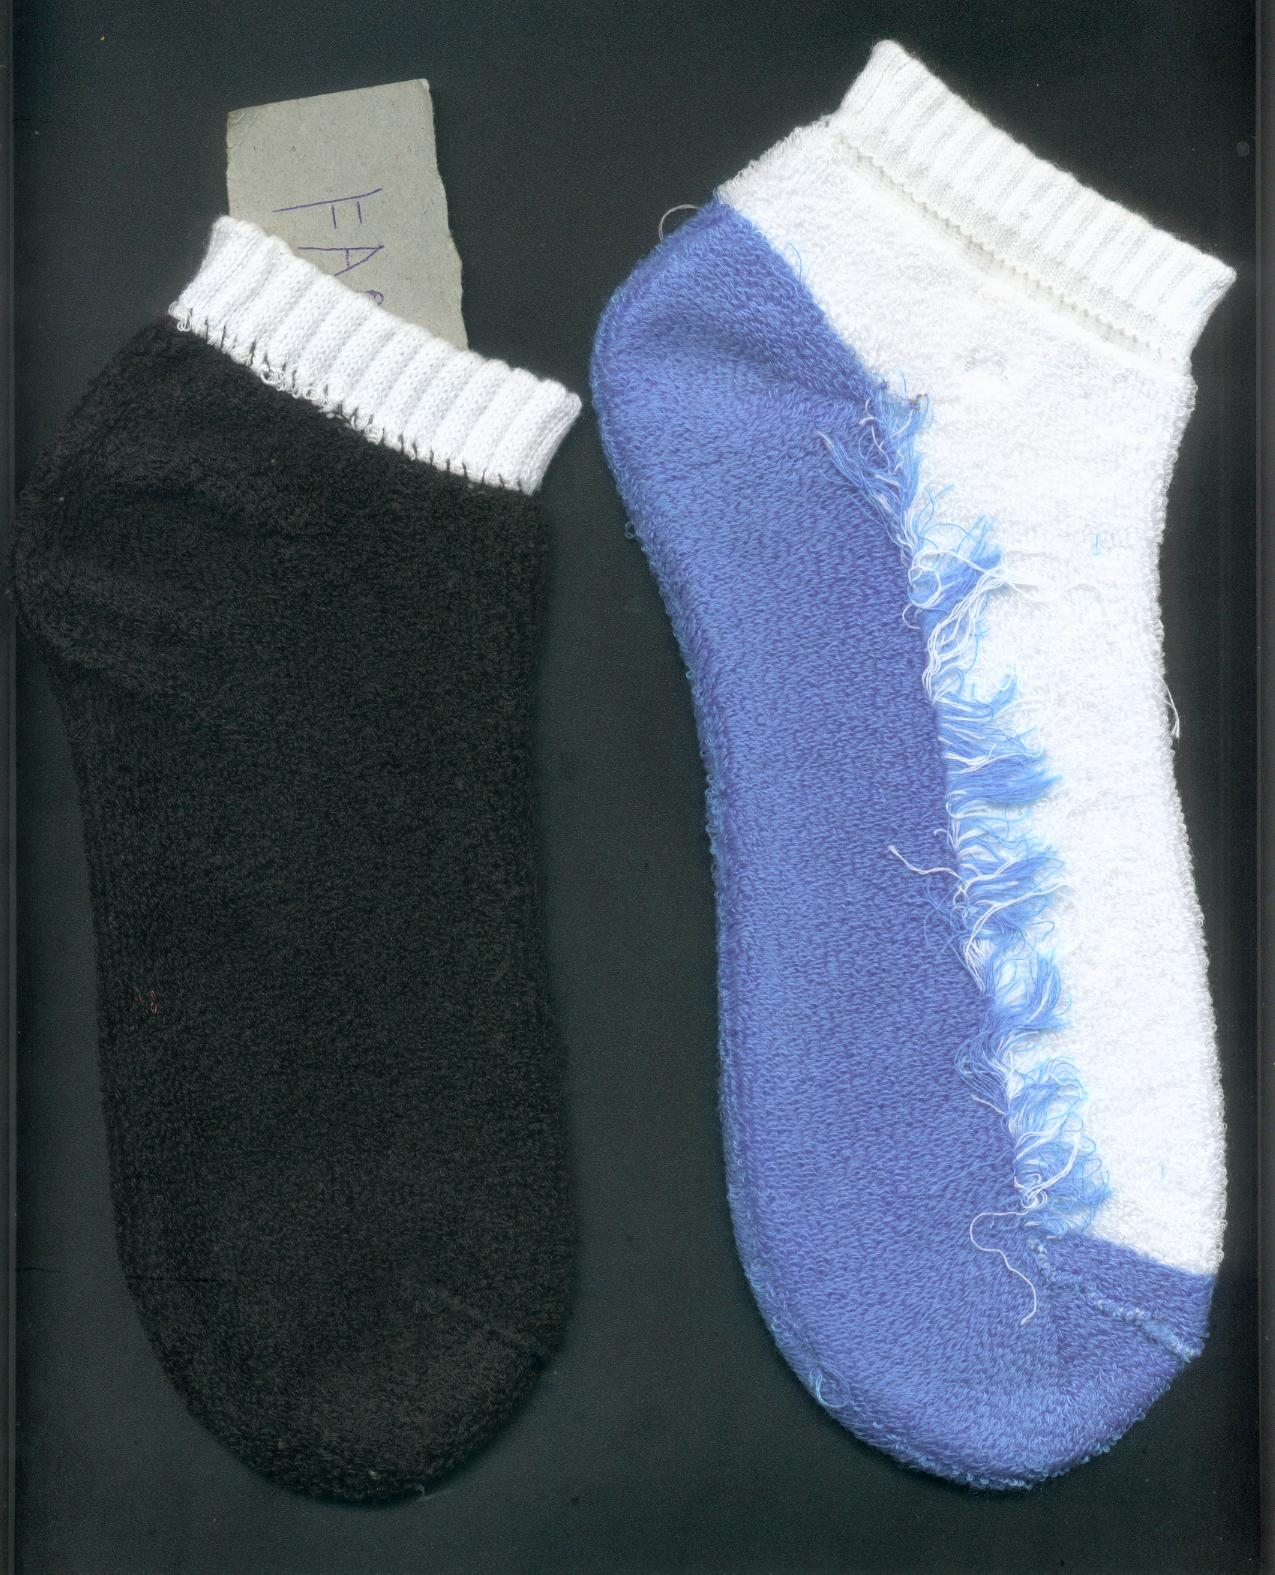 Sock manufacture provider